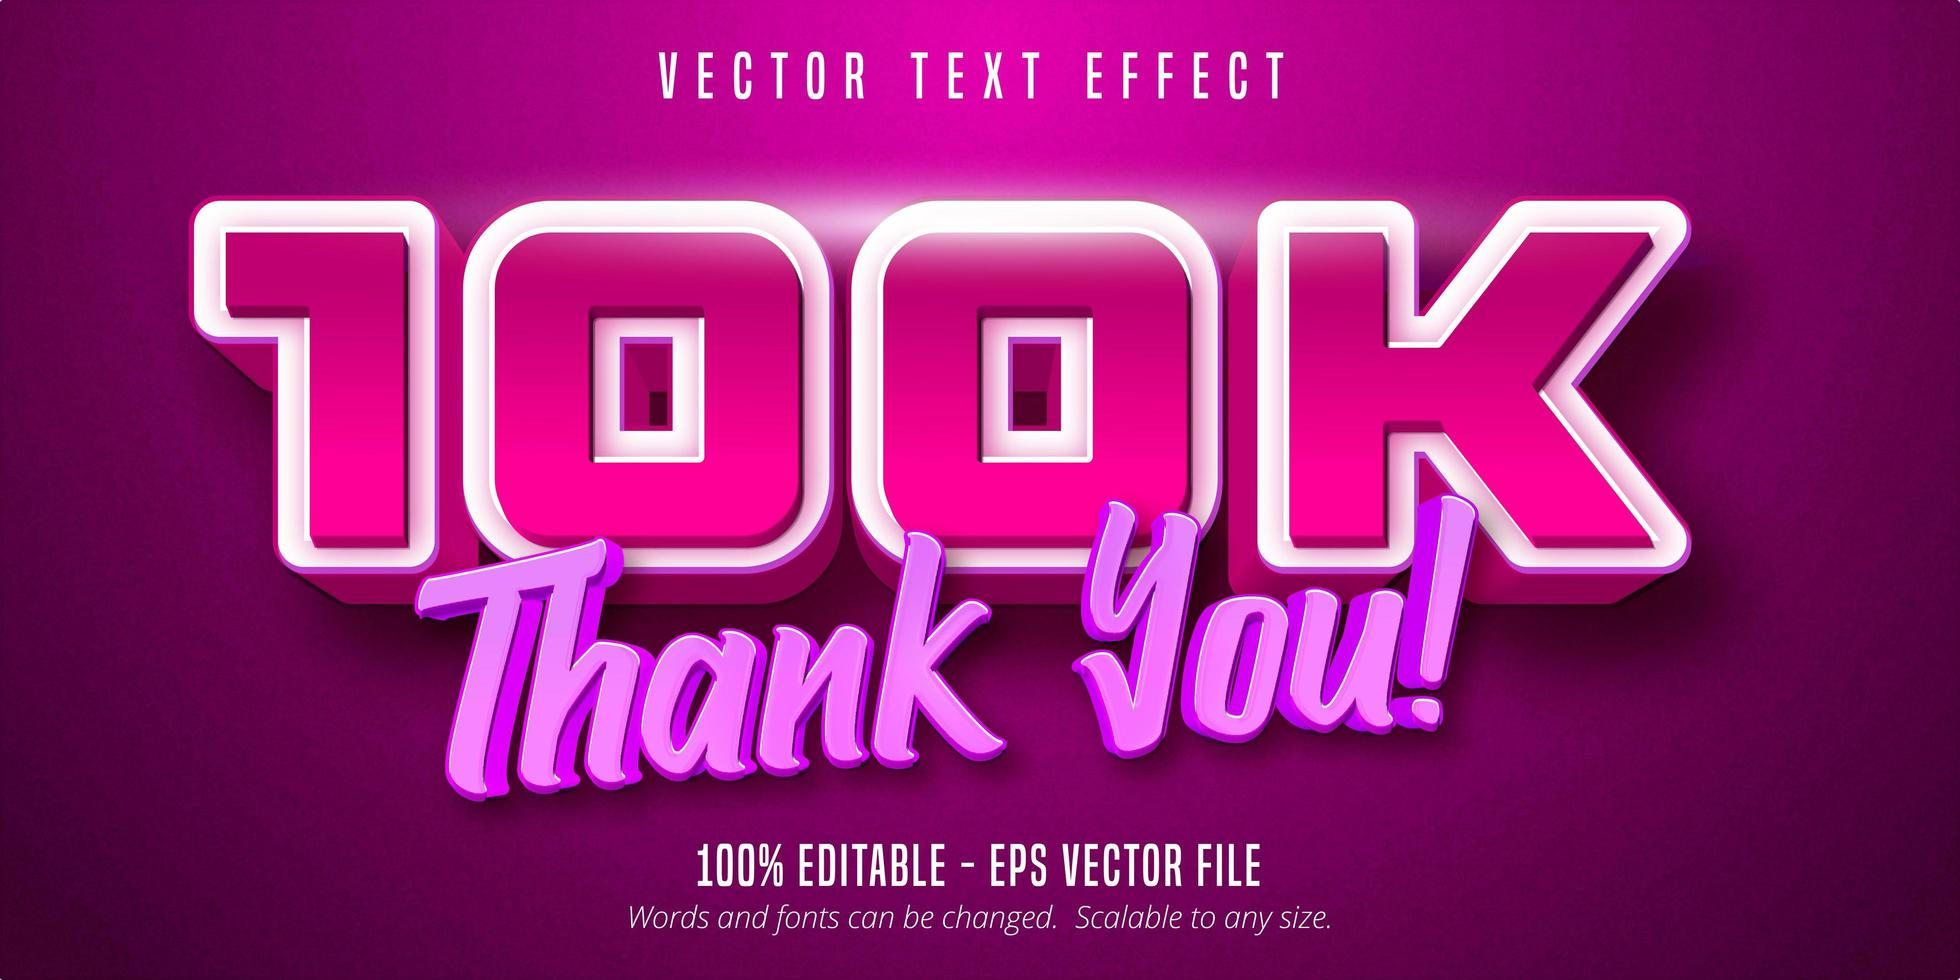 obrigado 100k texto vetor